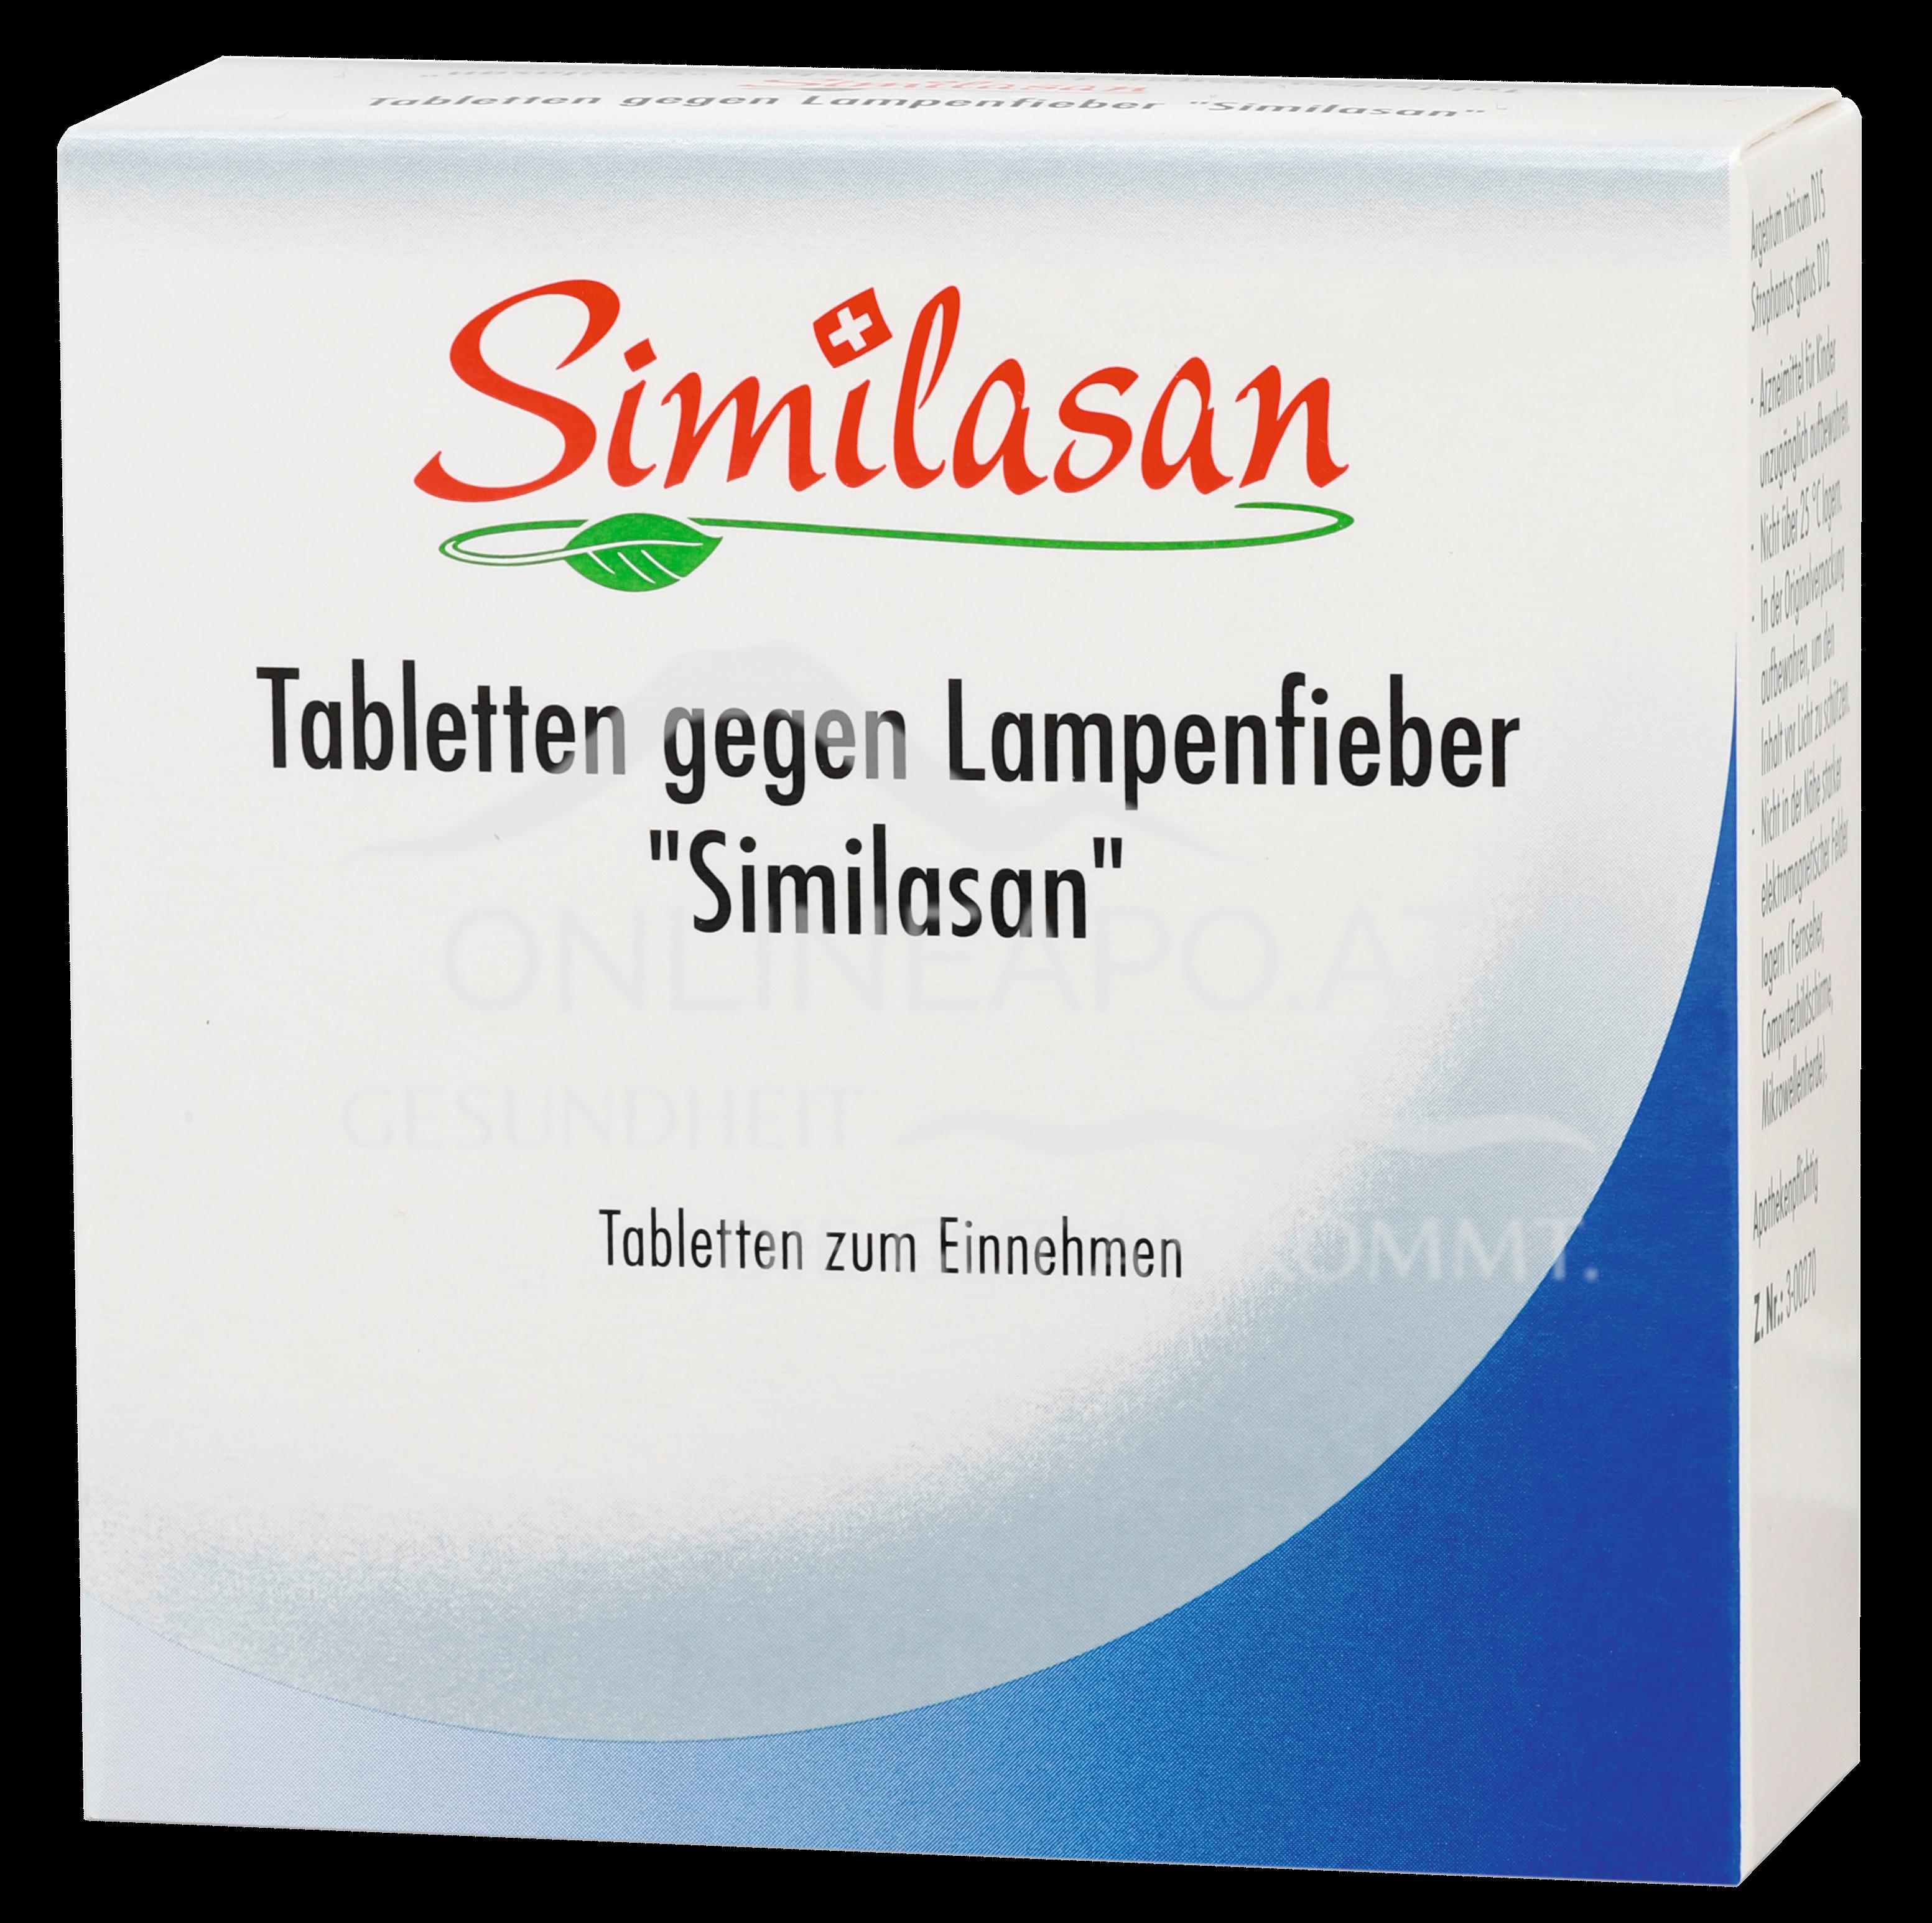 Similasan Lampenfieber-Tabletten